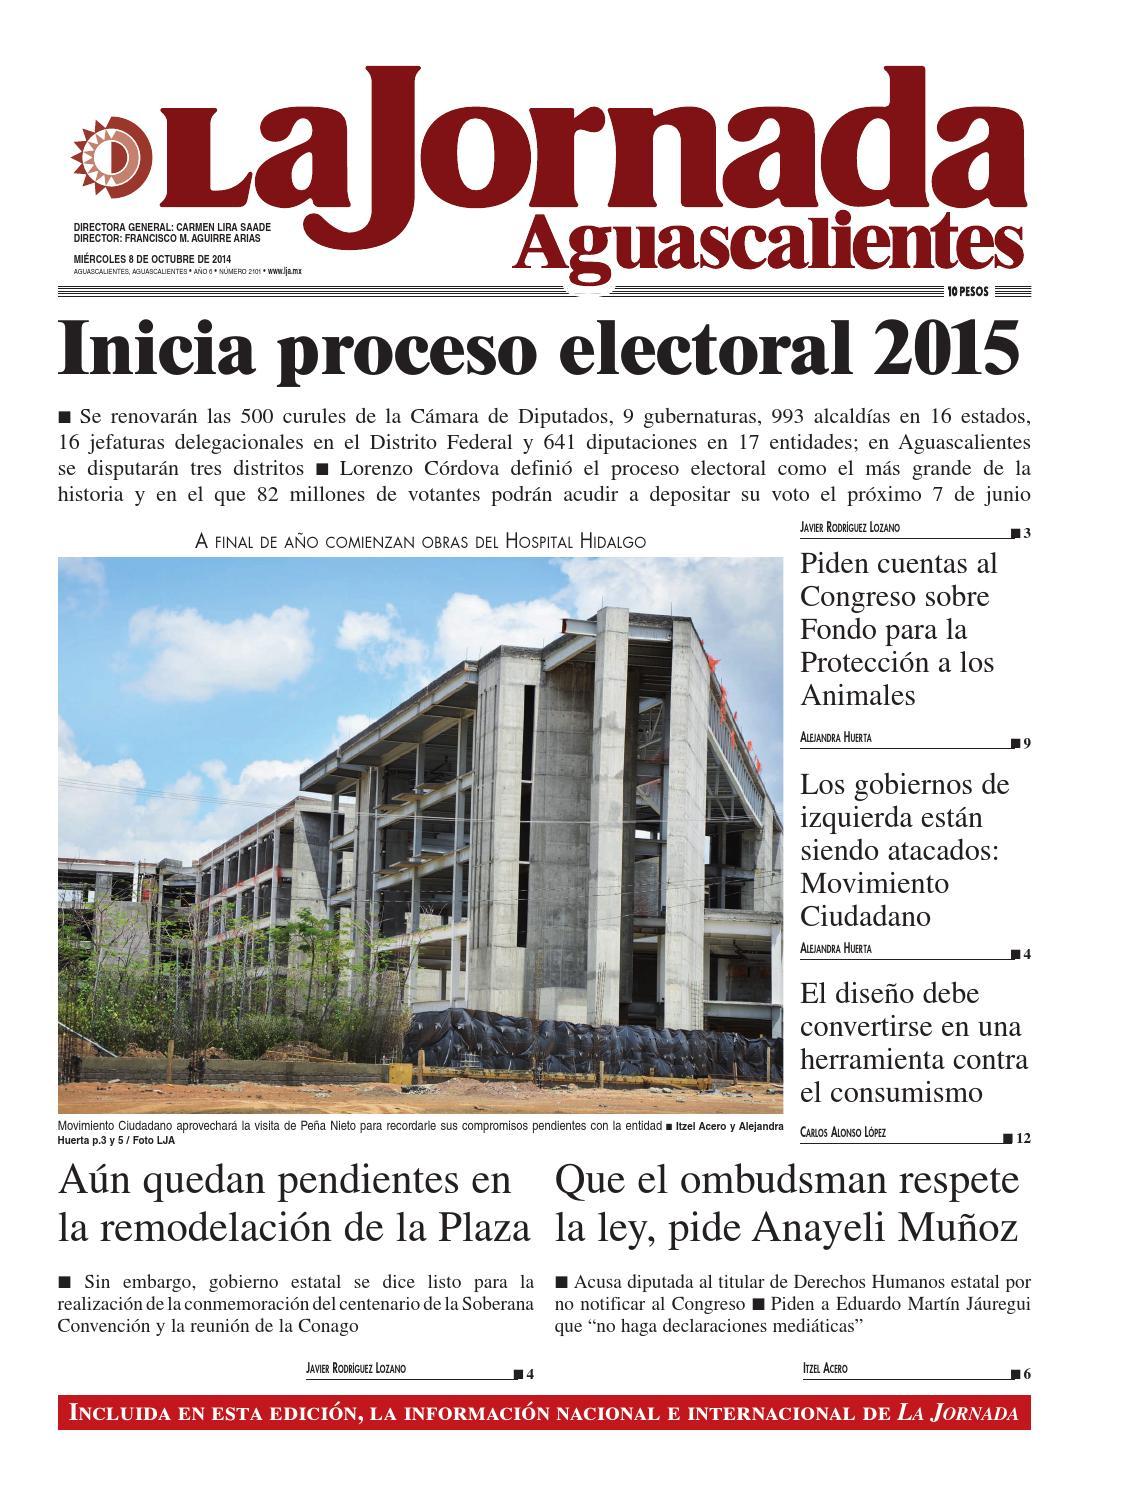 LJA08102014 by La Jornada Aguascalientes - issuu